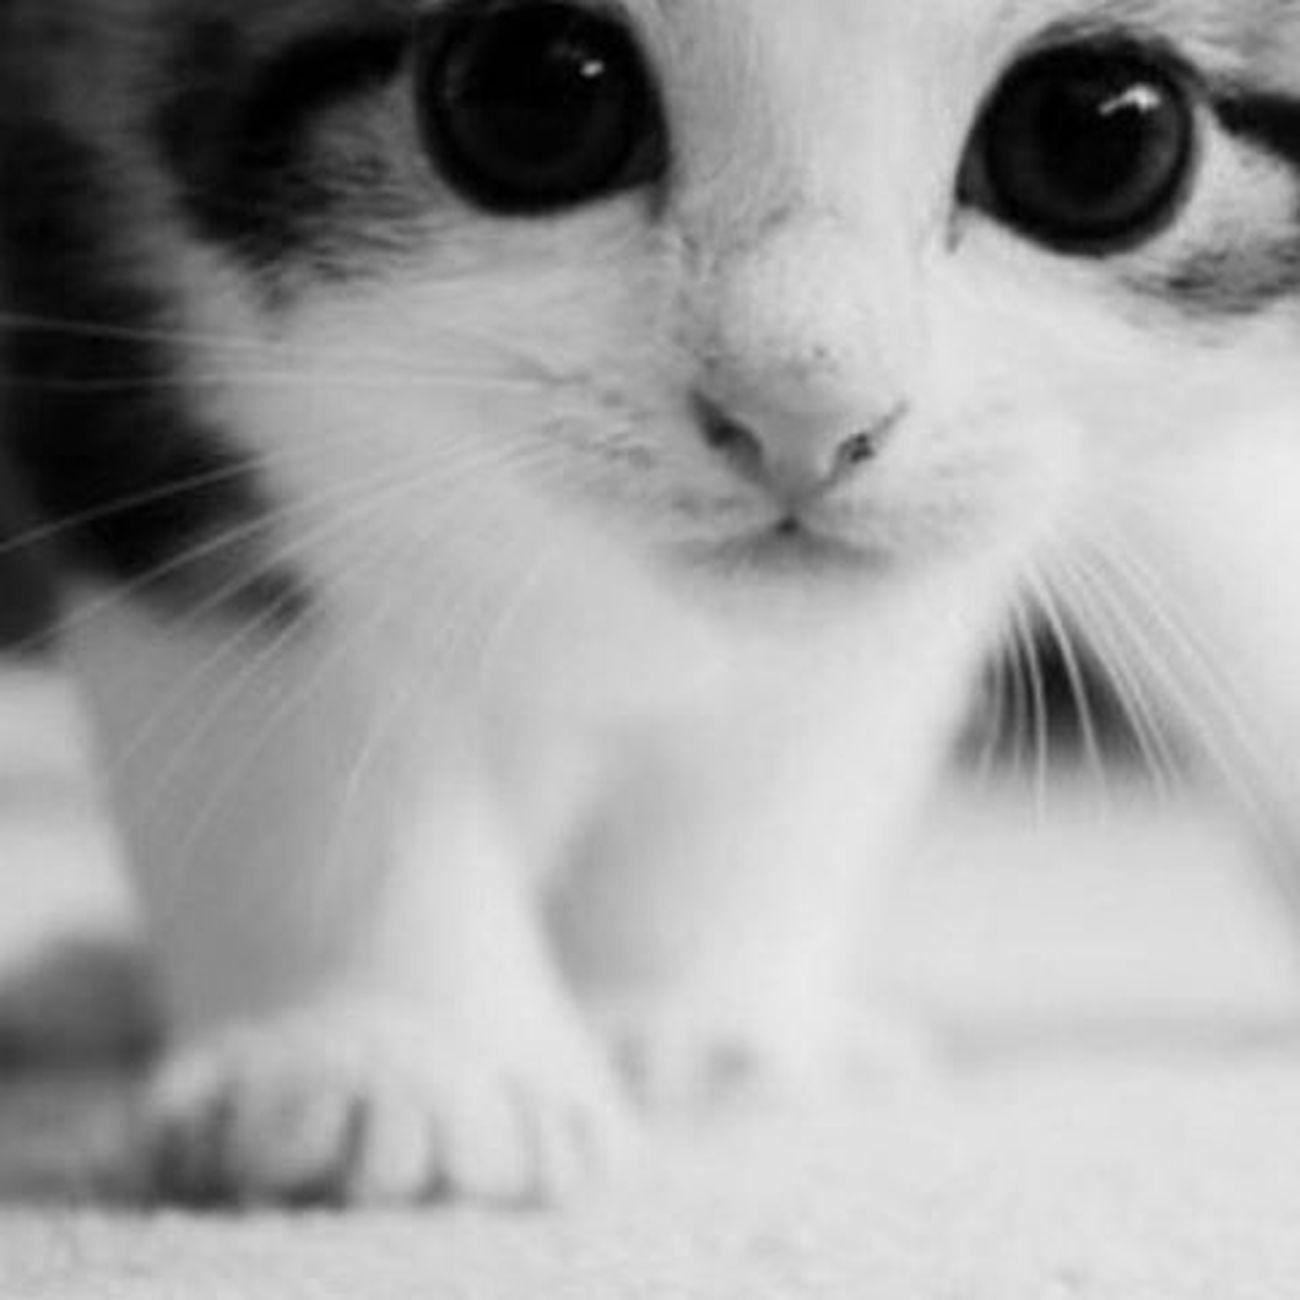 Cats_of_instagram Cats Animallover Kitty Kitten Save_animals Savethenature YouAreNotAlone Wearenotalone Instagram_turkey Instadaily Insta_people Instamood Instalike Instagram Kedi Kediler Hayatasaygı Yasam Hayvanlarıkoruyalım Love Look Lovely Cute